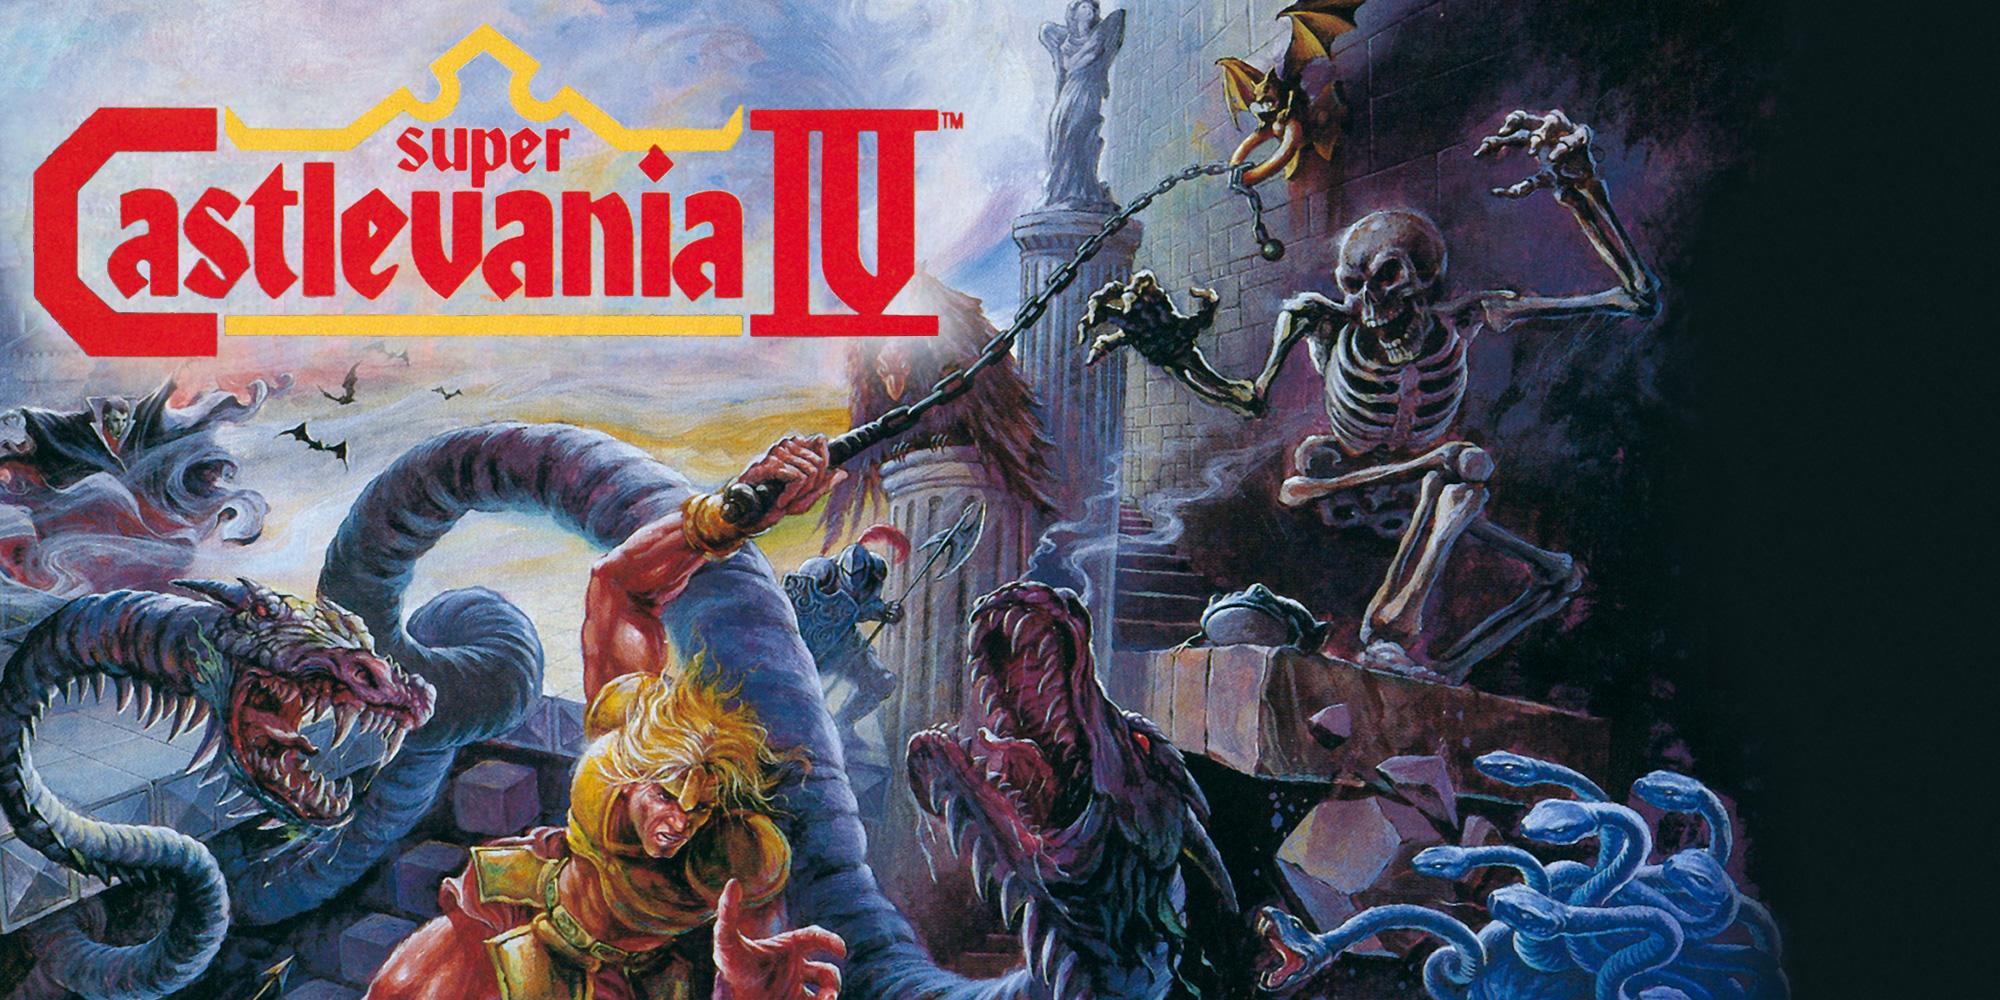 Super Castlevania IV | Super Nintendo |Best Snes Games